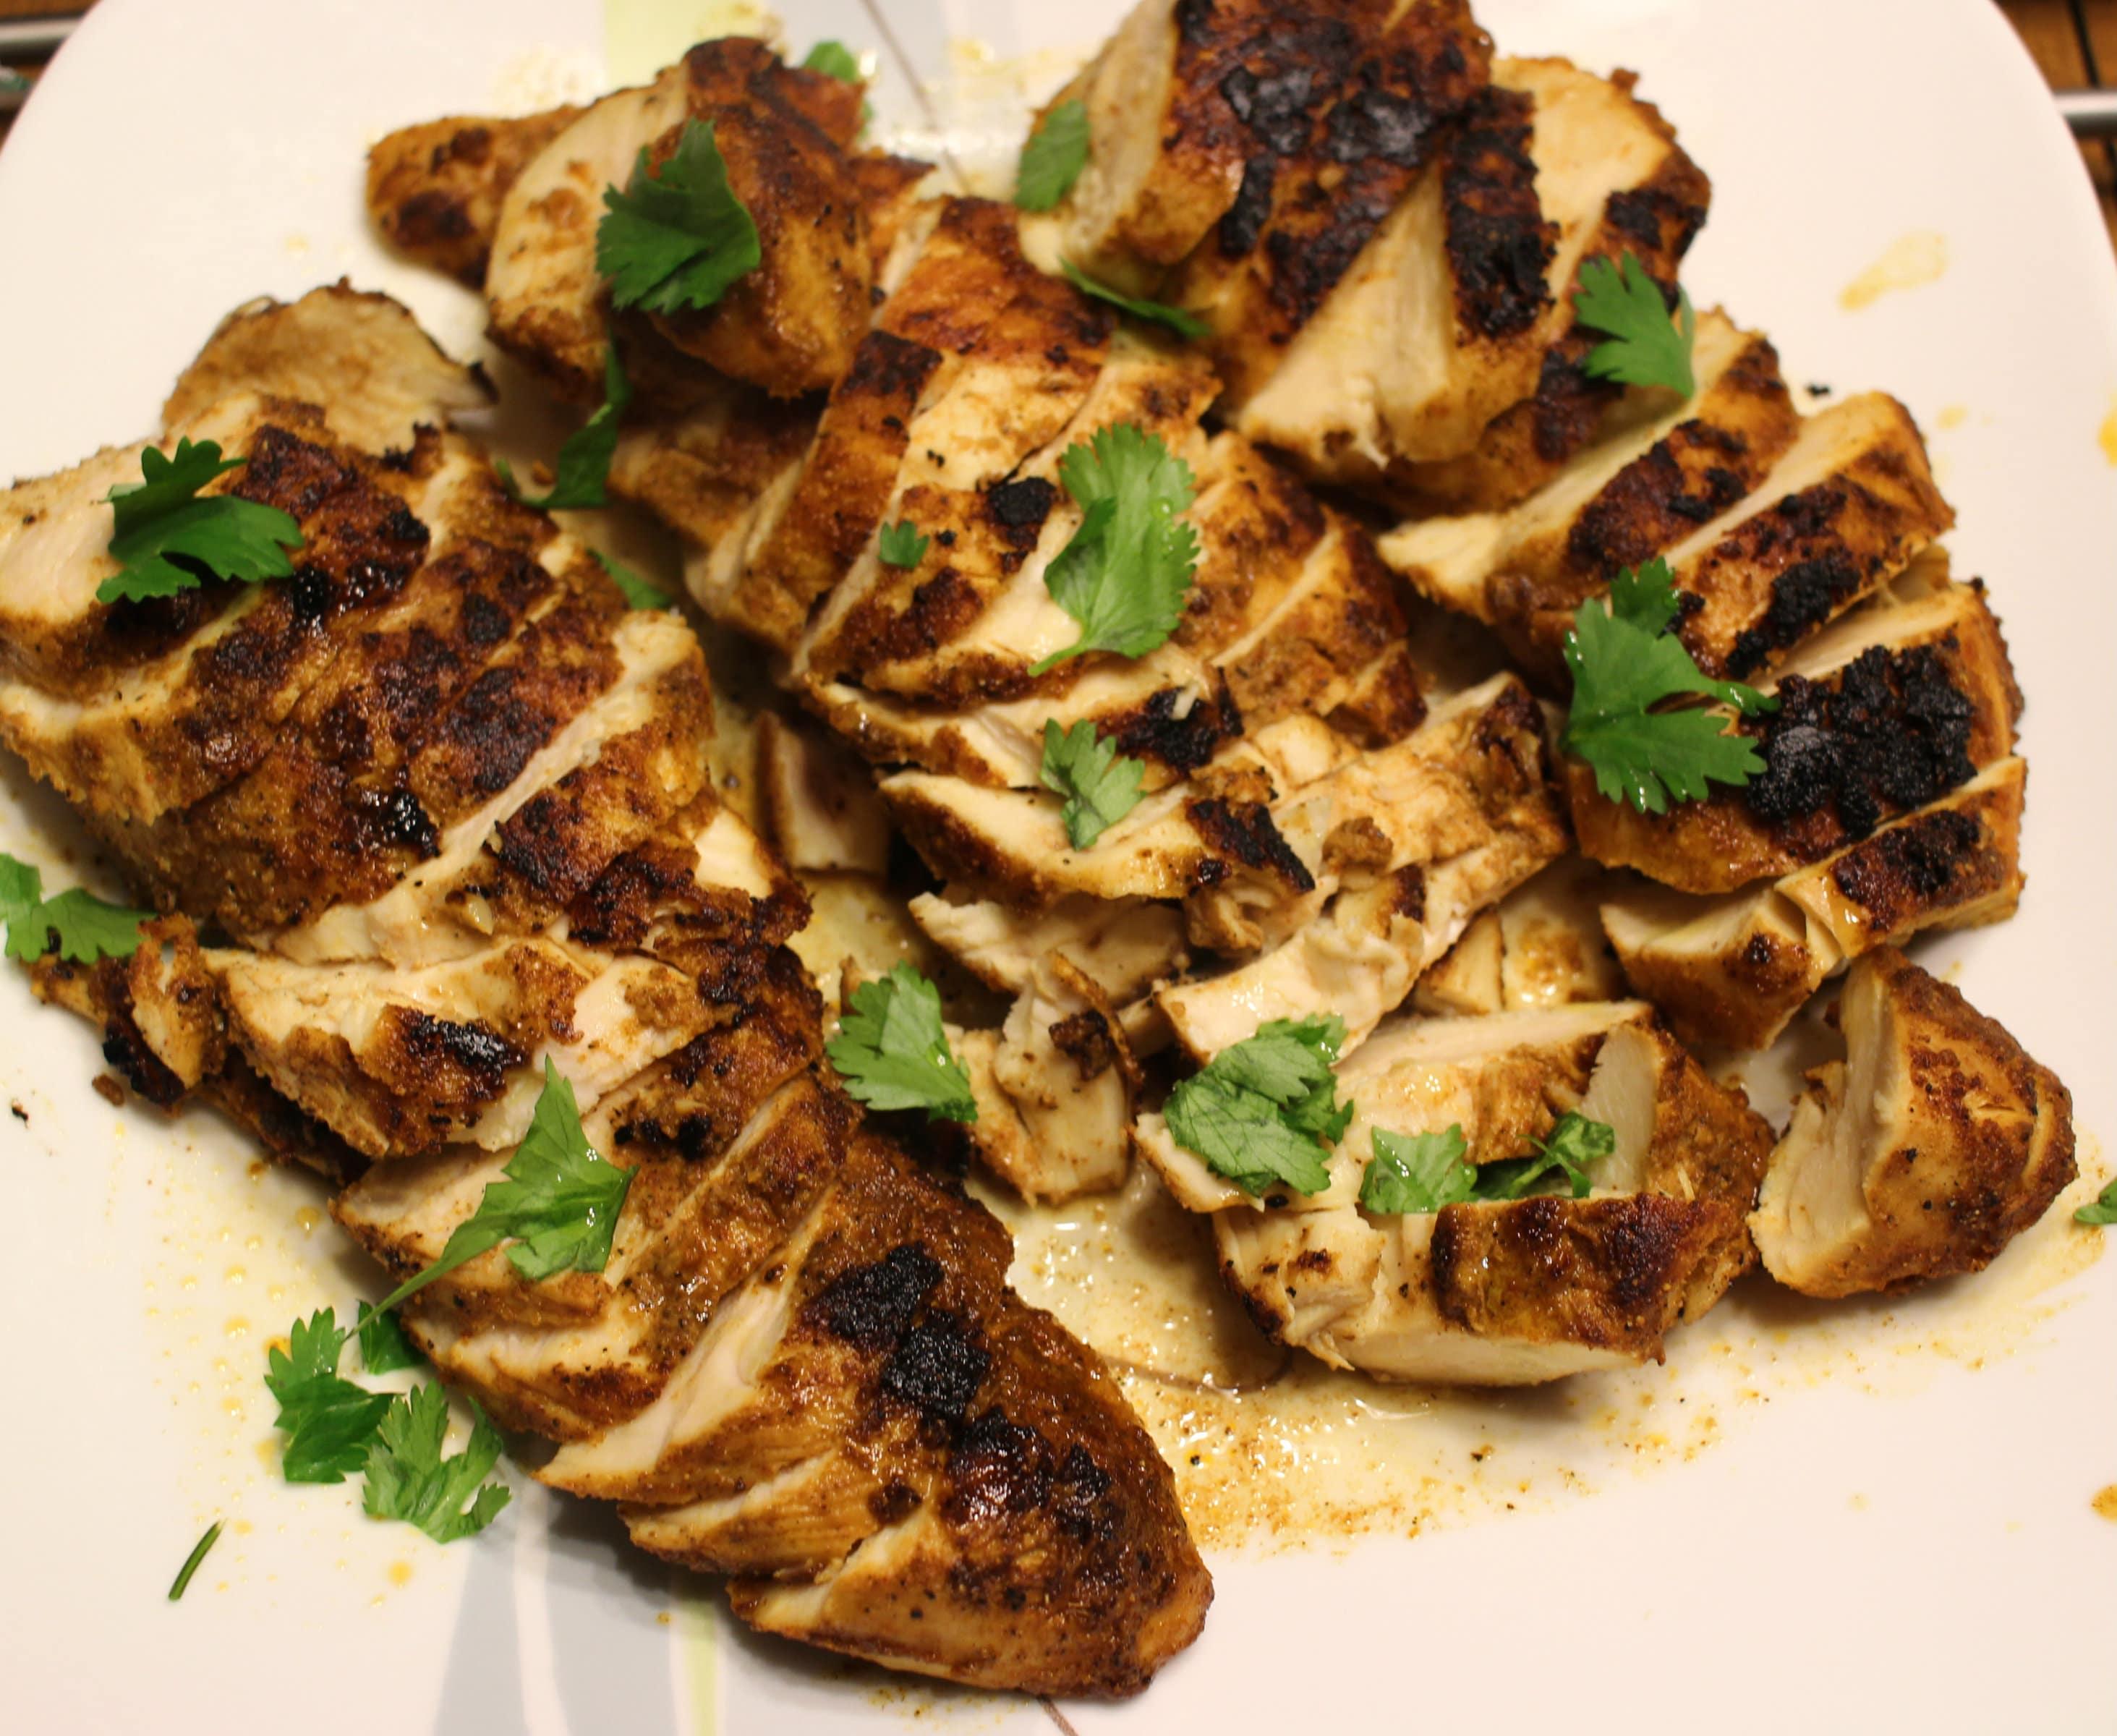 Amazing Chicken Shawarma - The Chunky Chef